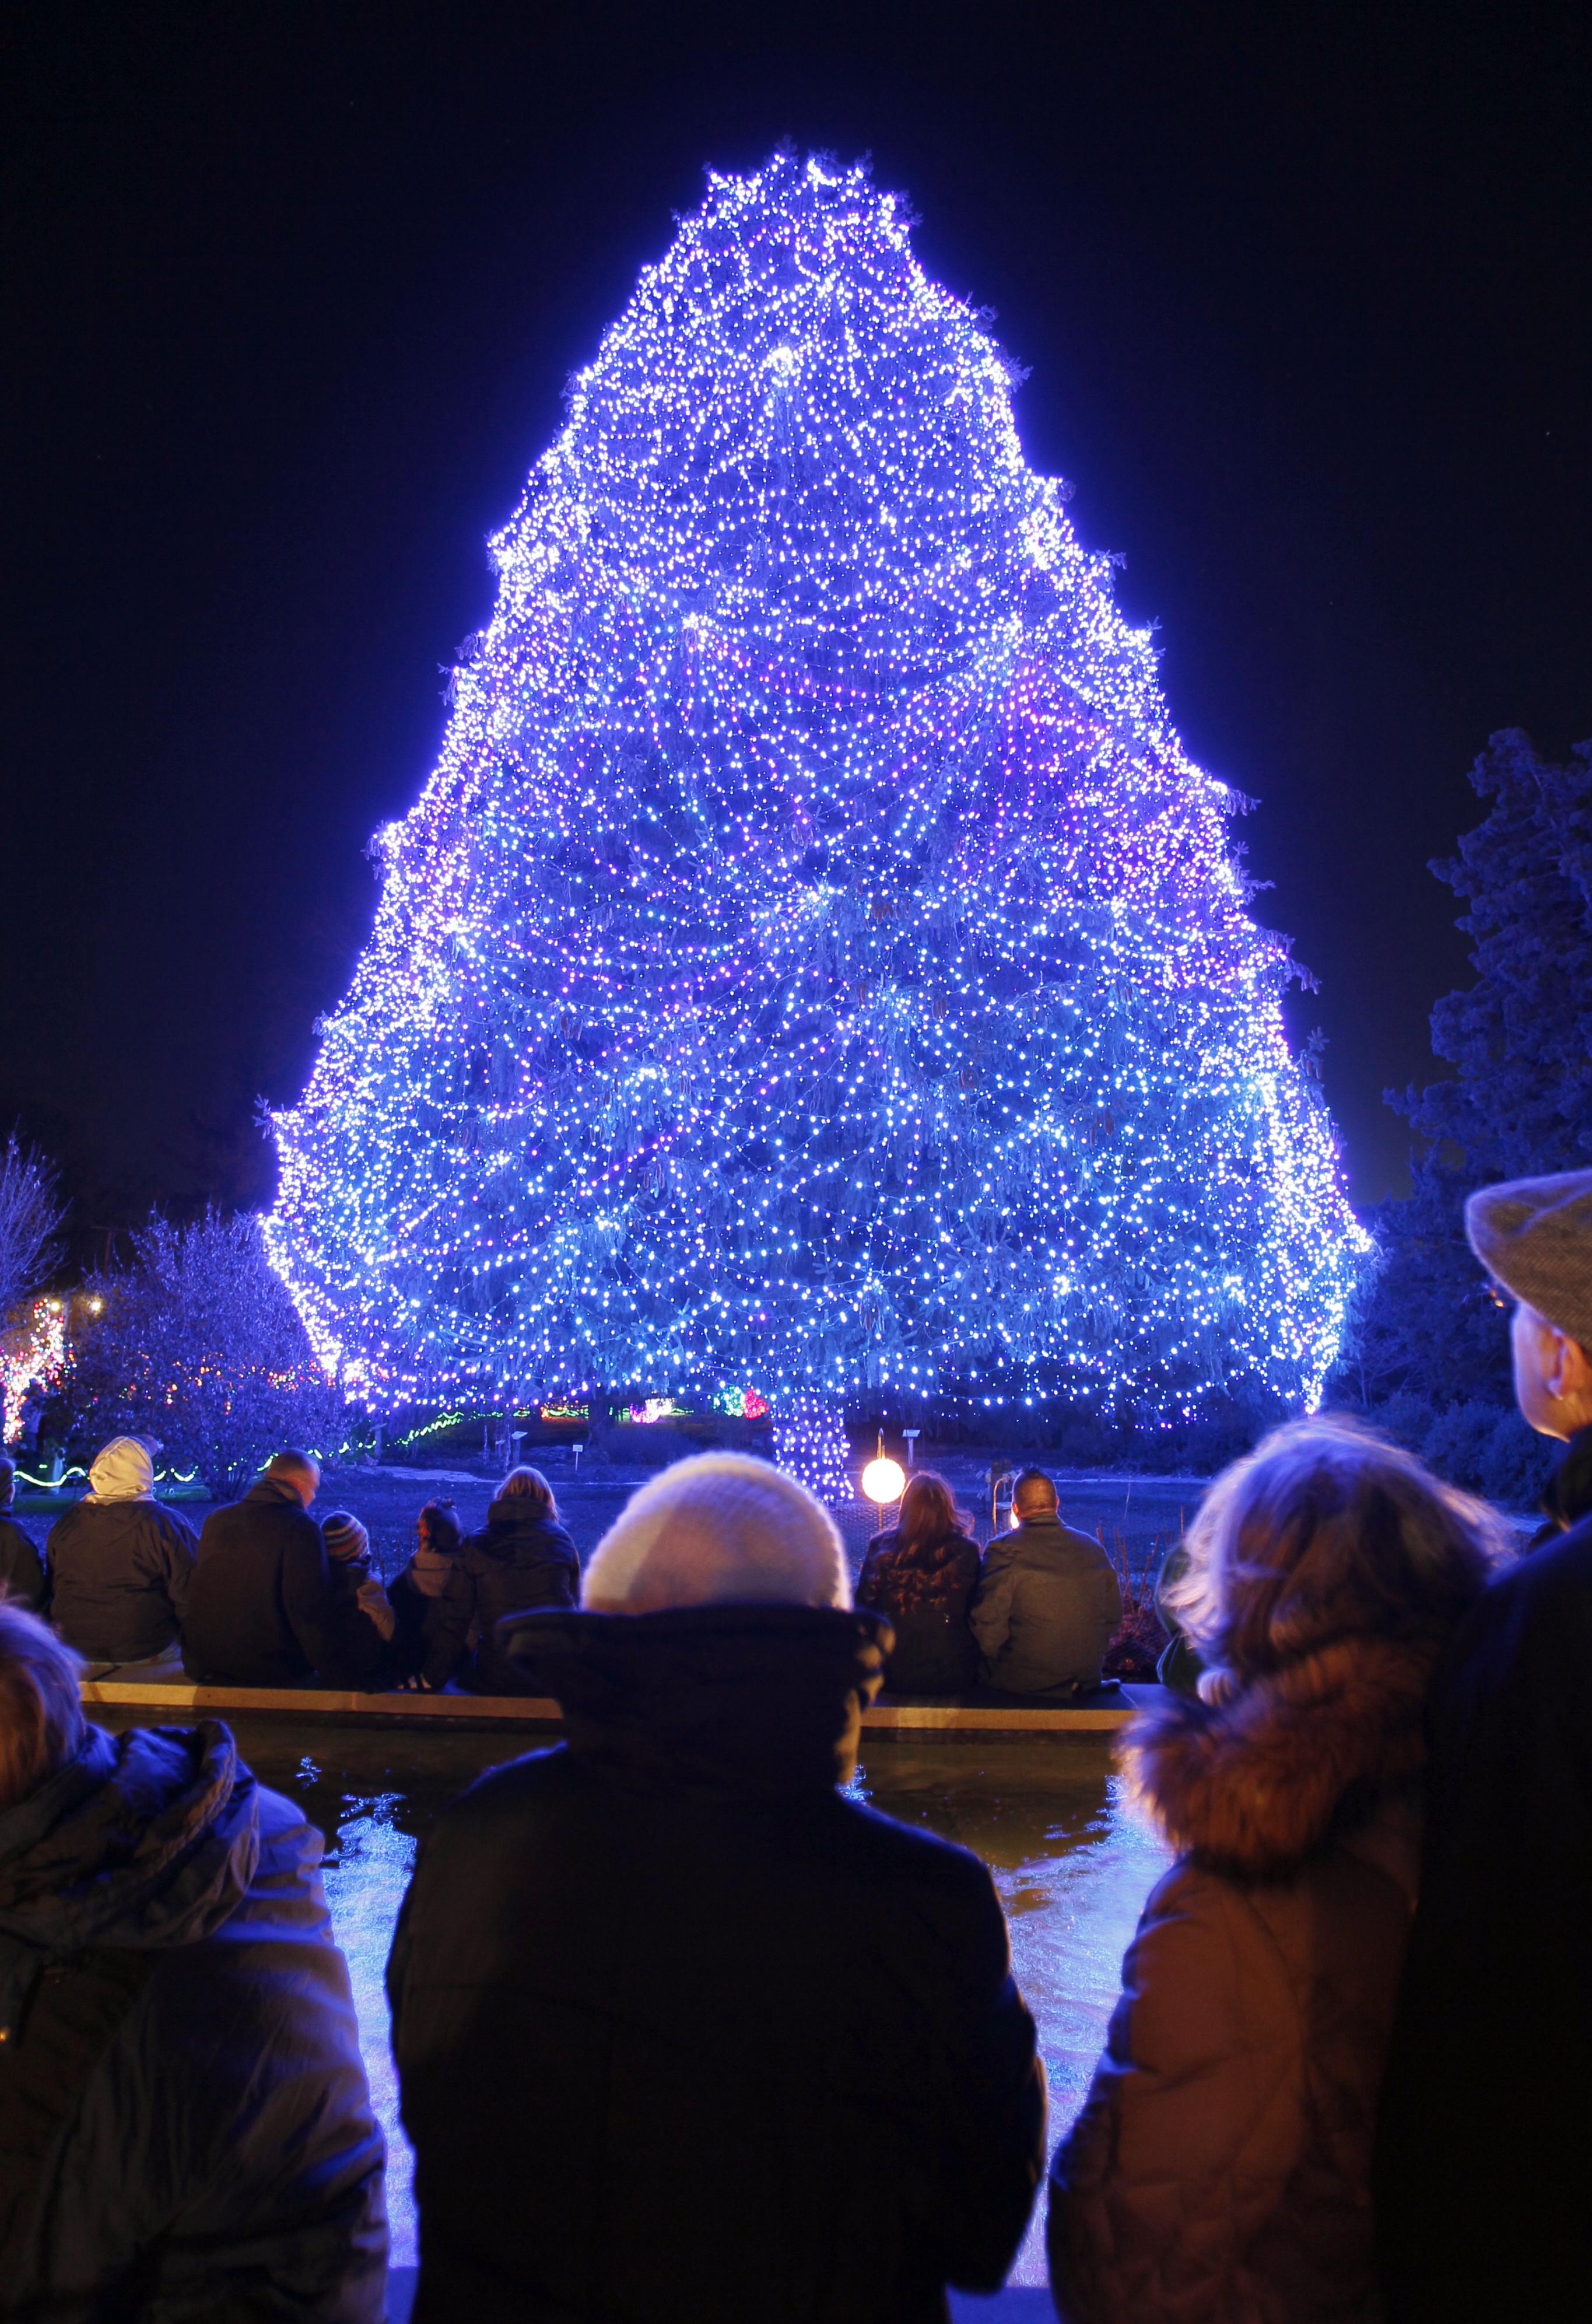 lights before christmas lights up toledo zoo the blade - Lights Before Christmas Toledo Zoo